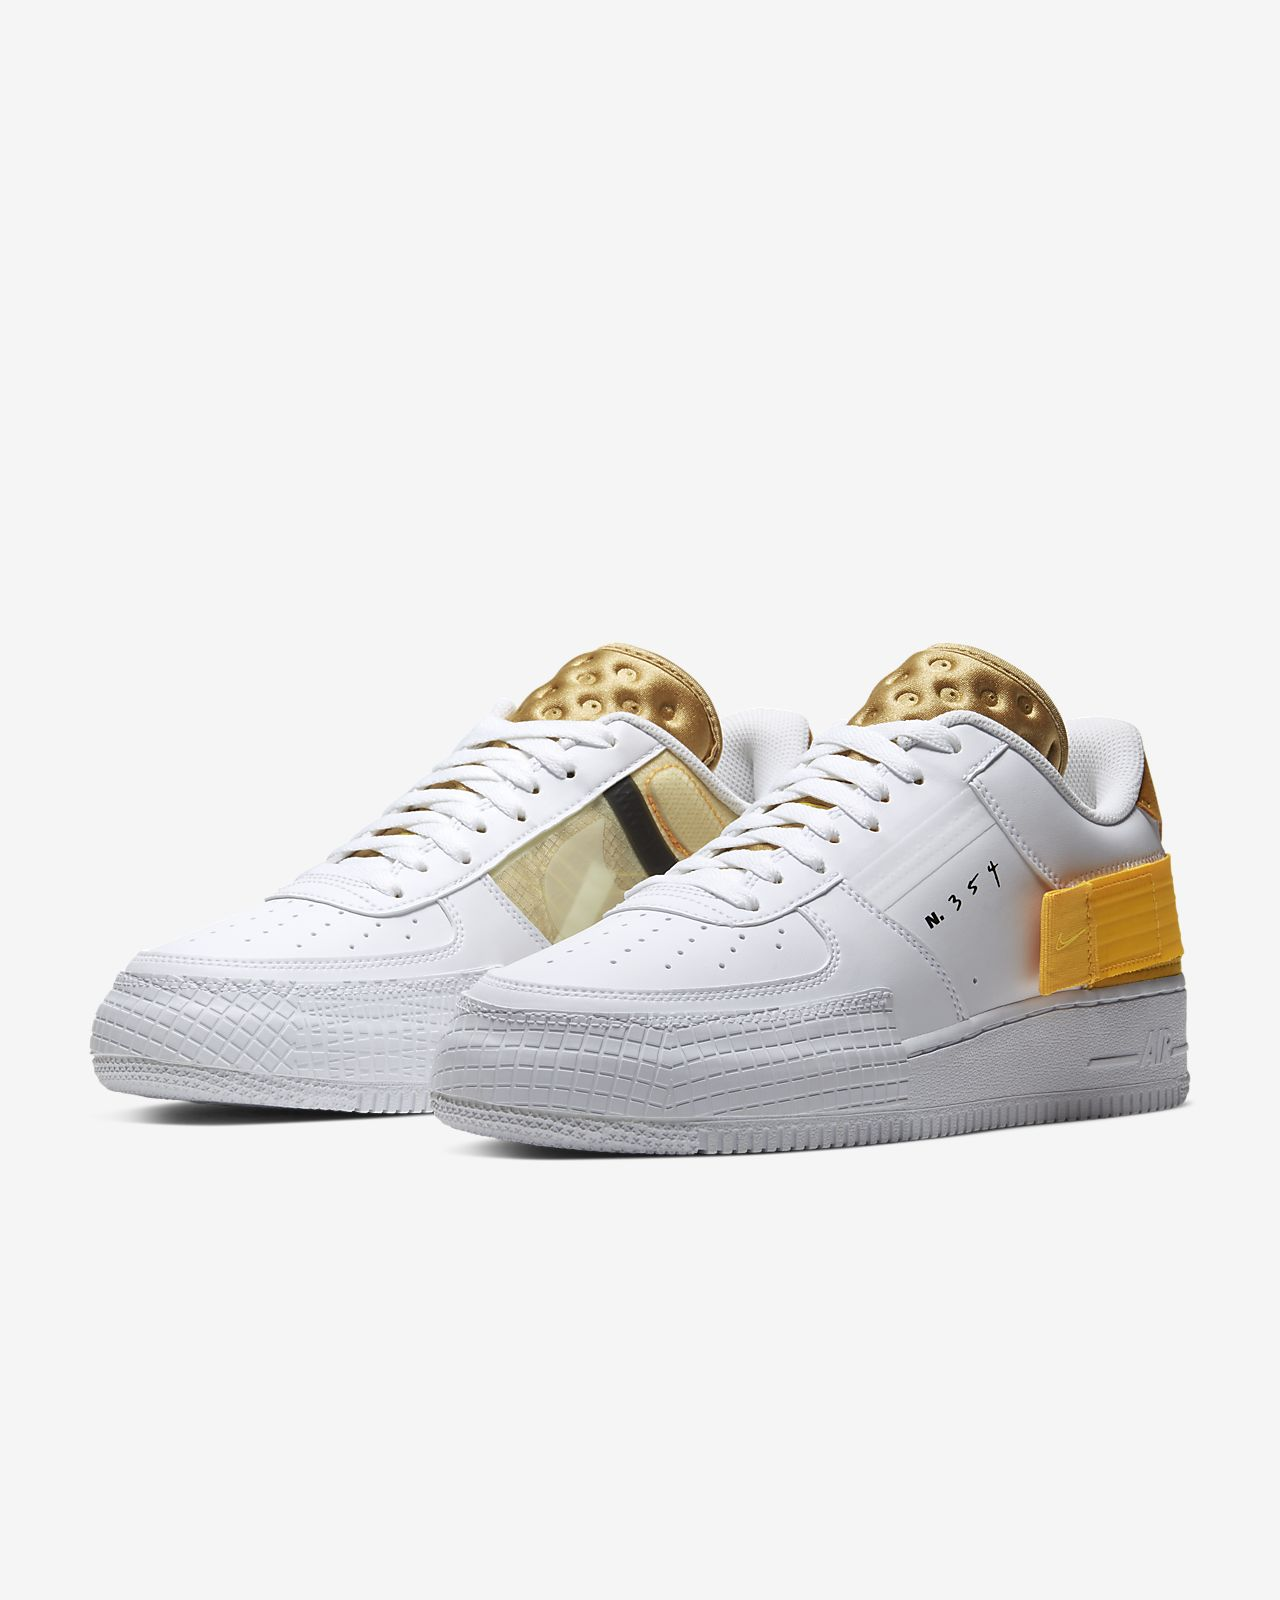 Nike Air Force Gold White design im